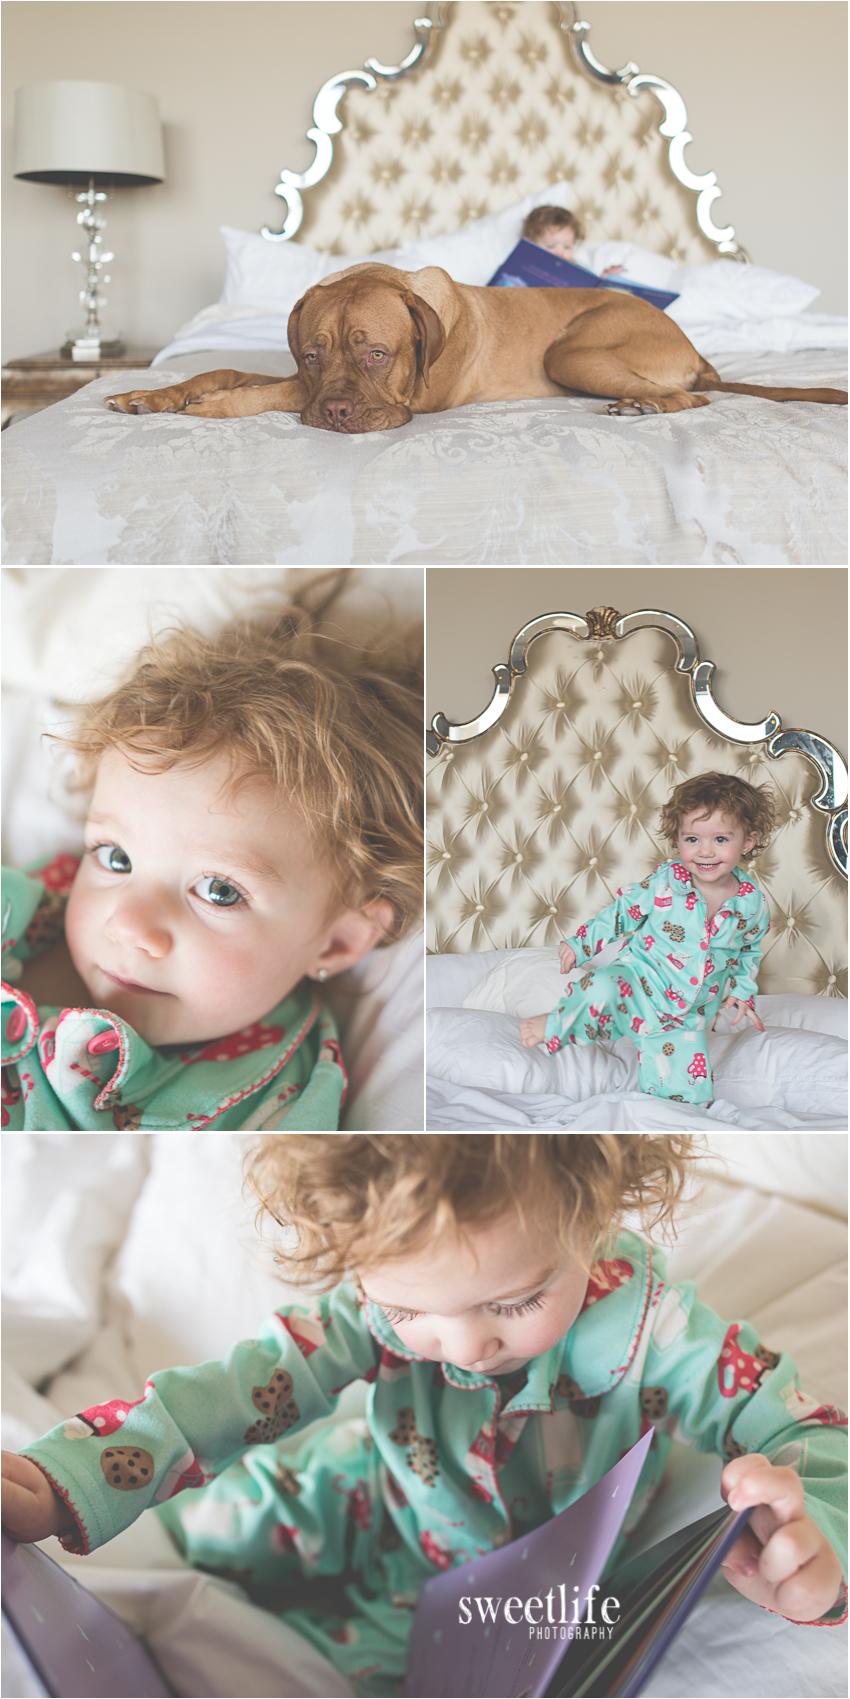 North Phoenix Lifestyle Photographer :: SweetLife Photography